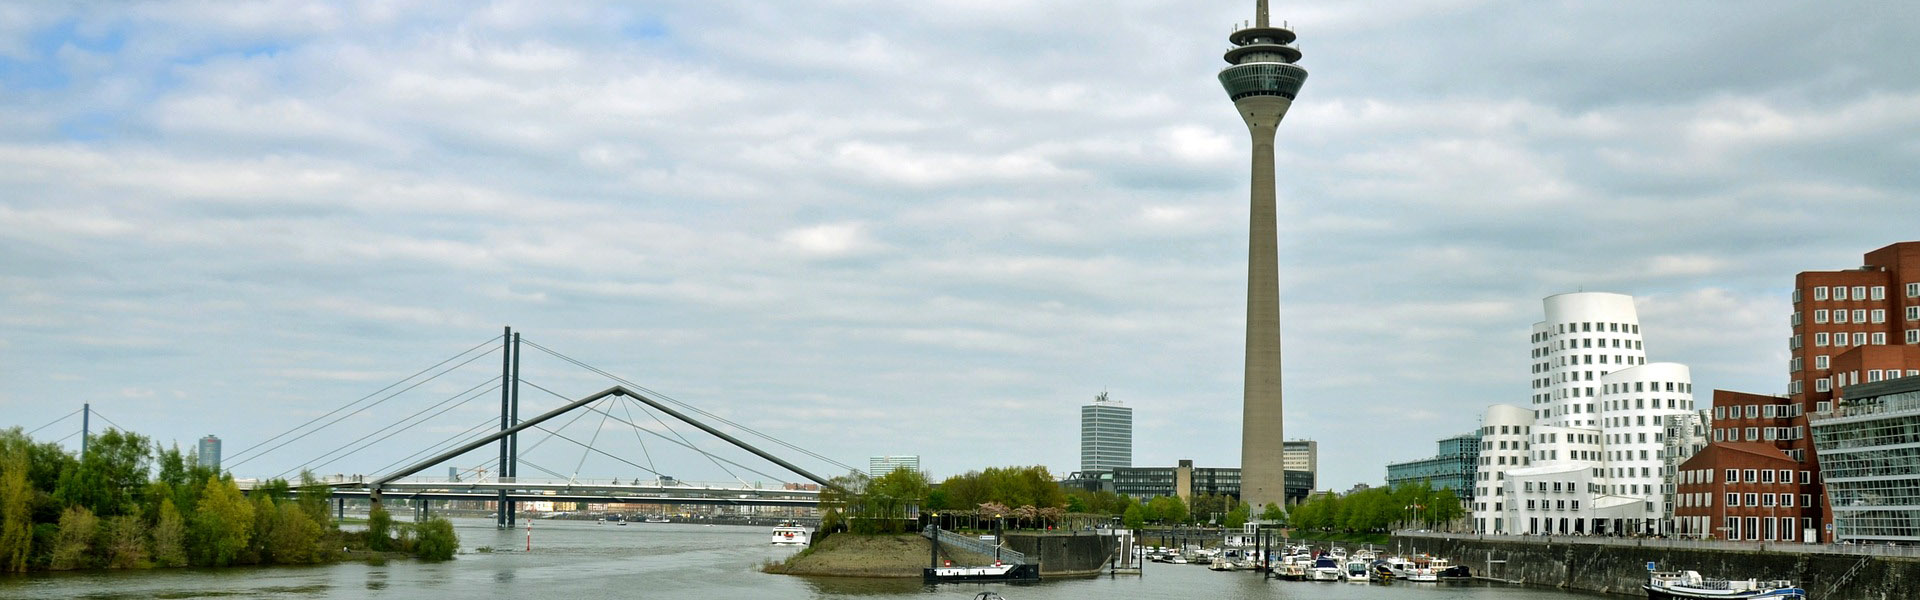 Bg Düsseldorf